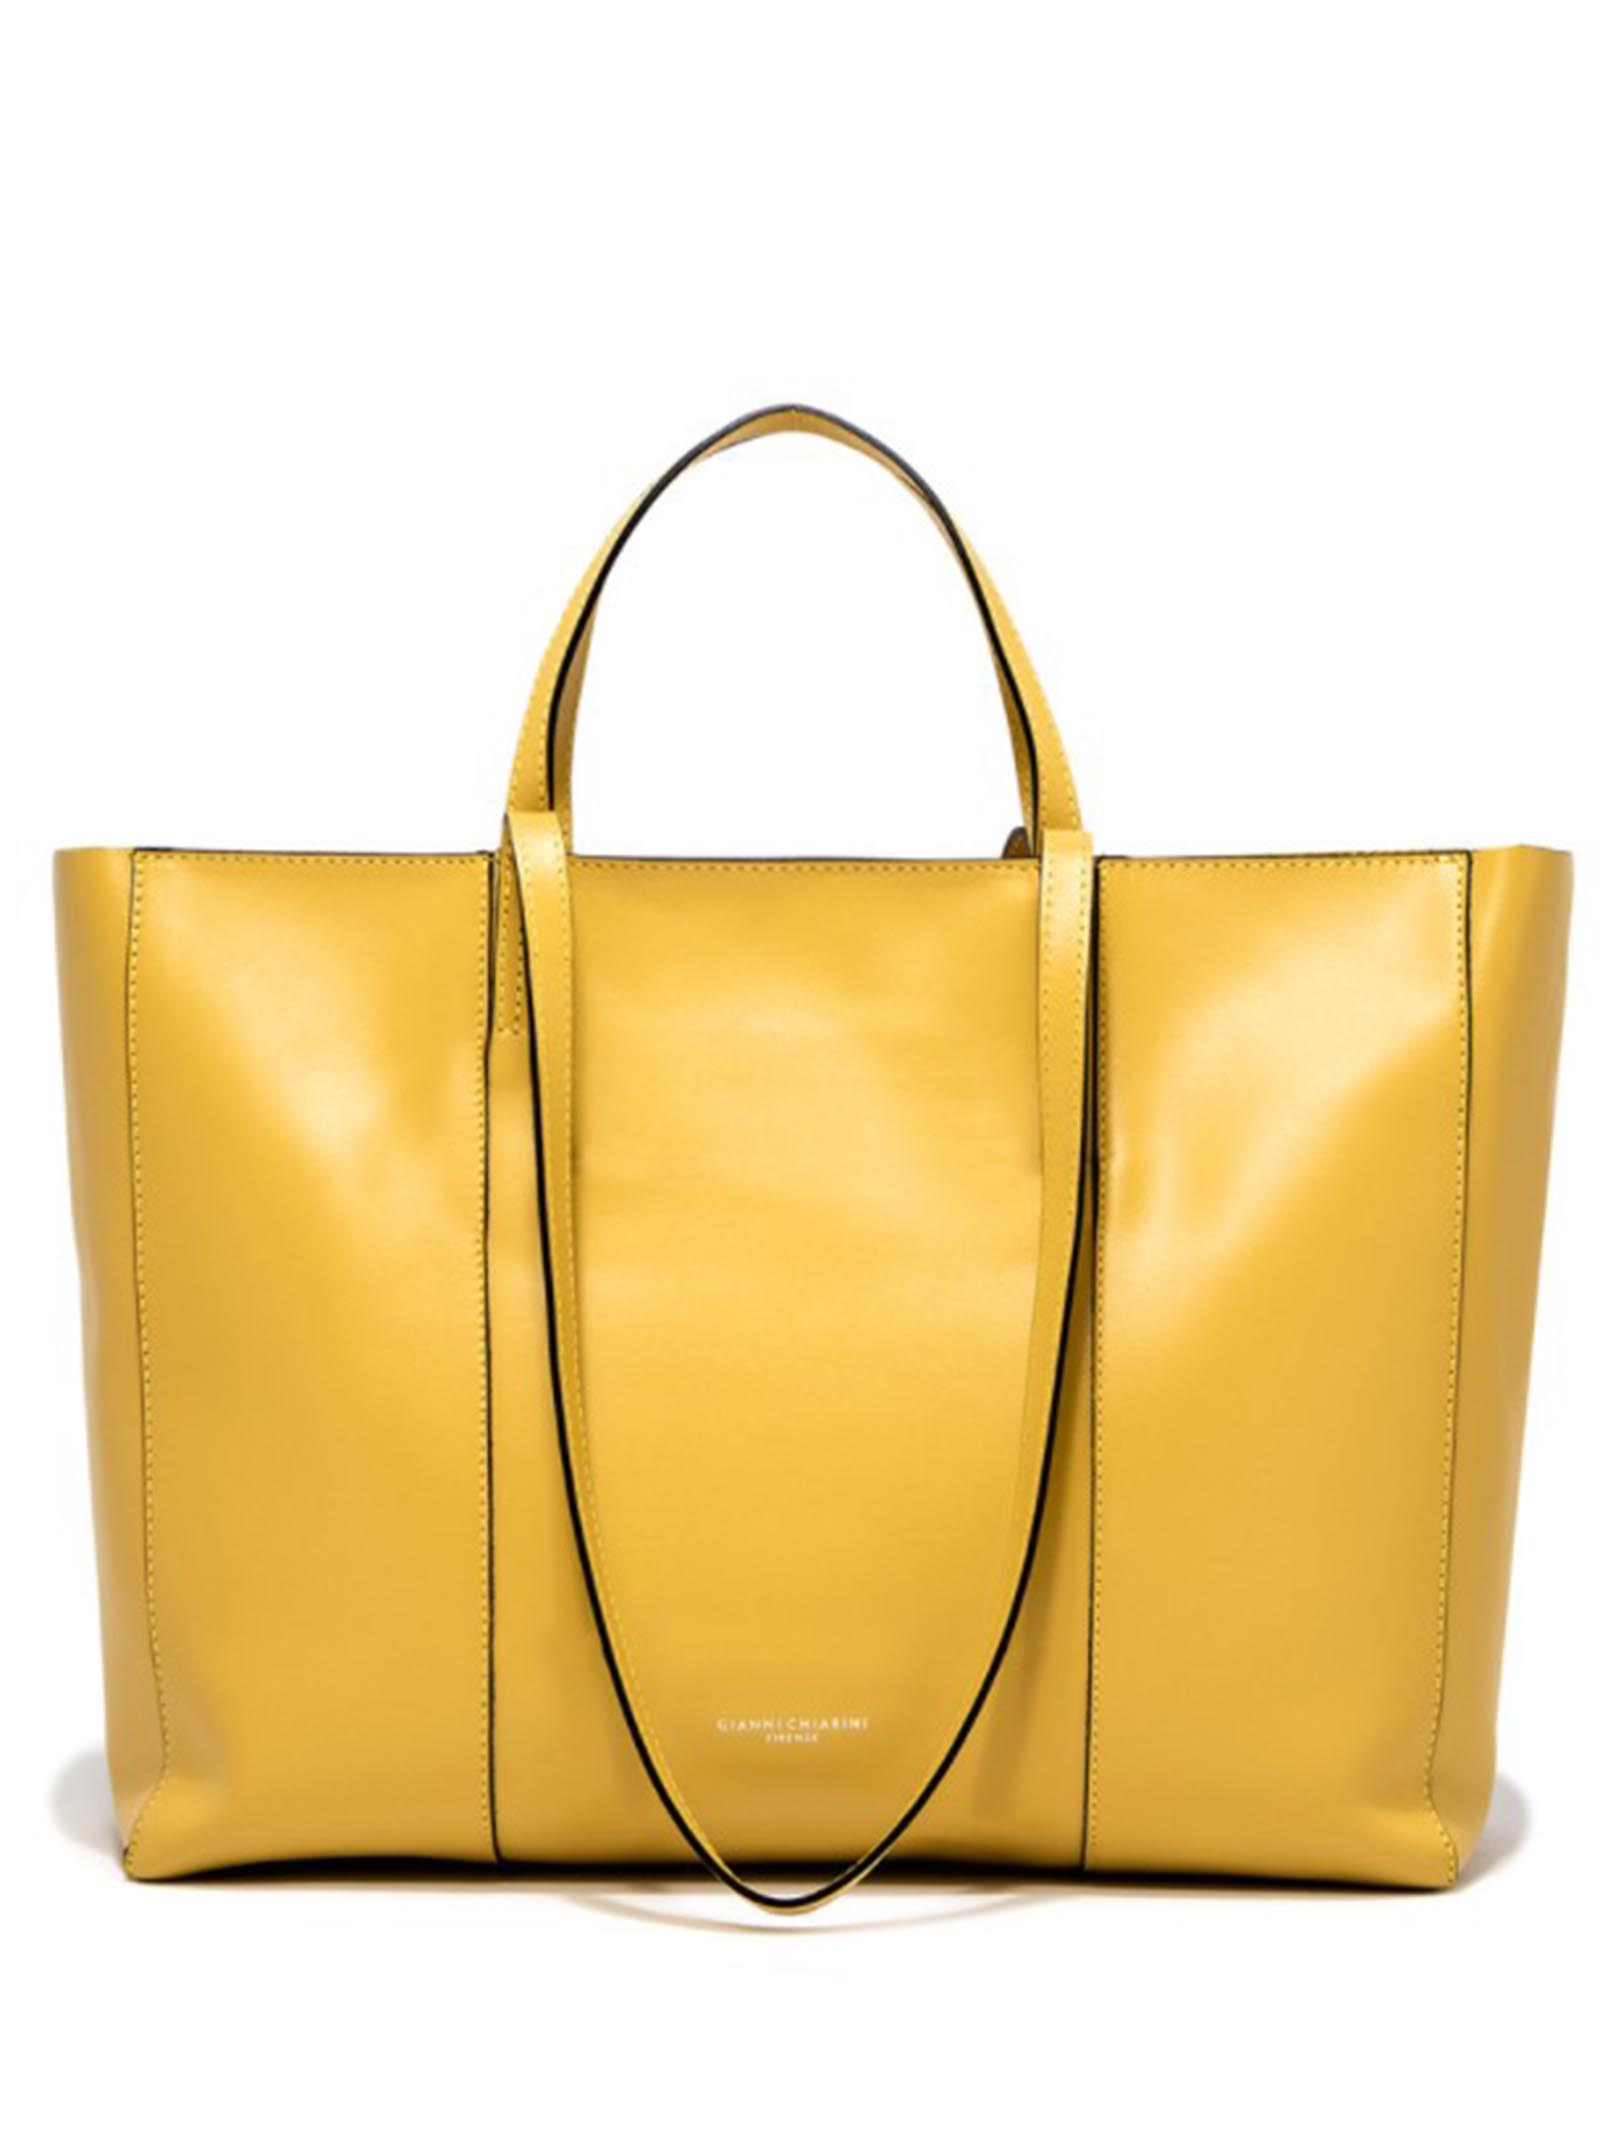 Gianni Chiarini | Bags and backpacks | BS735711040